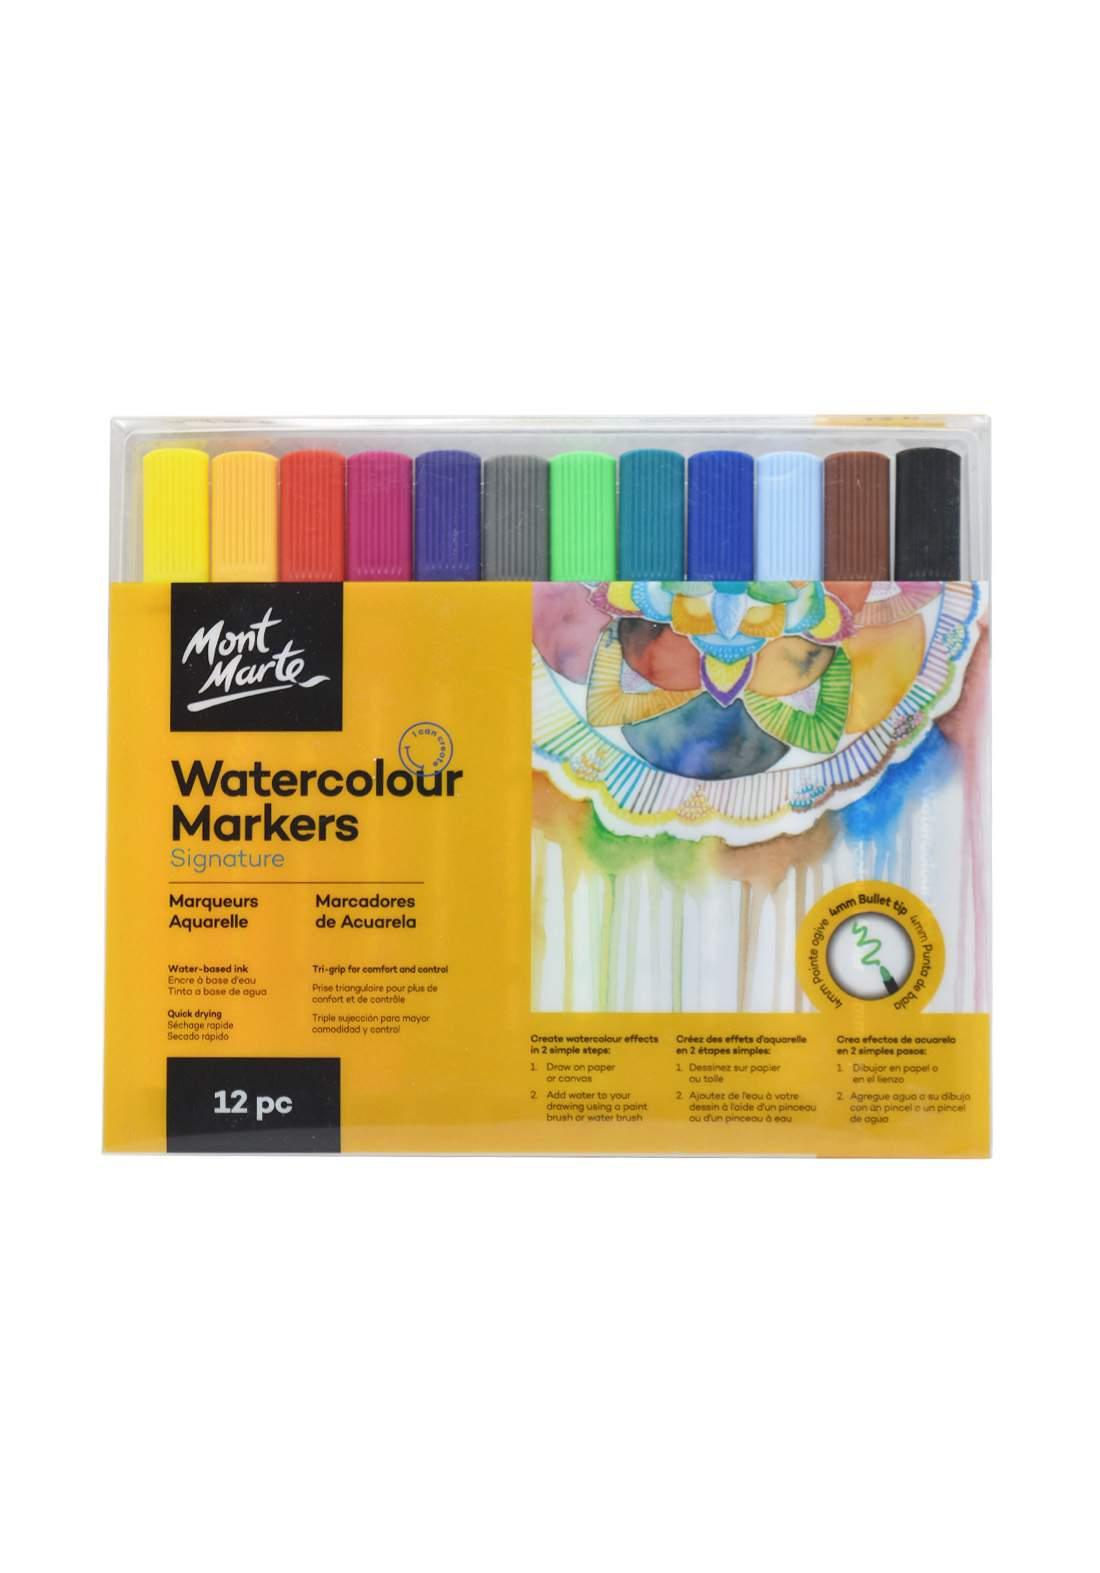 Mont Marte Signature Watercolour Markers 12Pcs 4mm  أقلام تلوين مائية